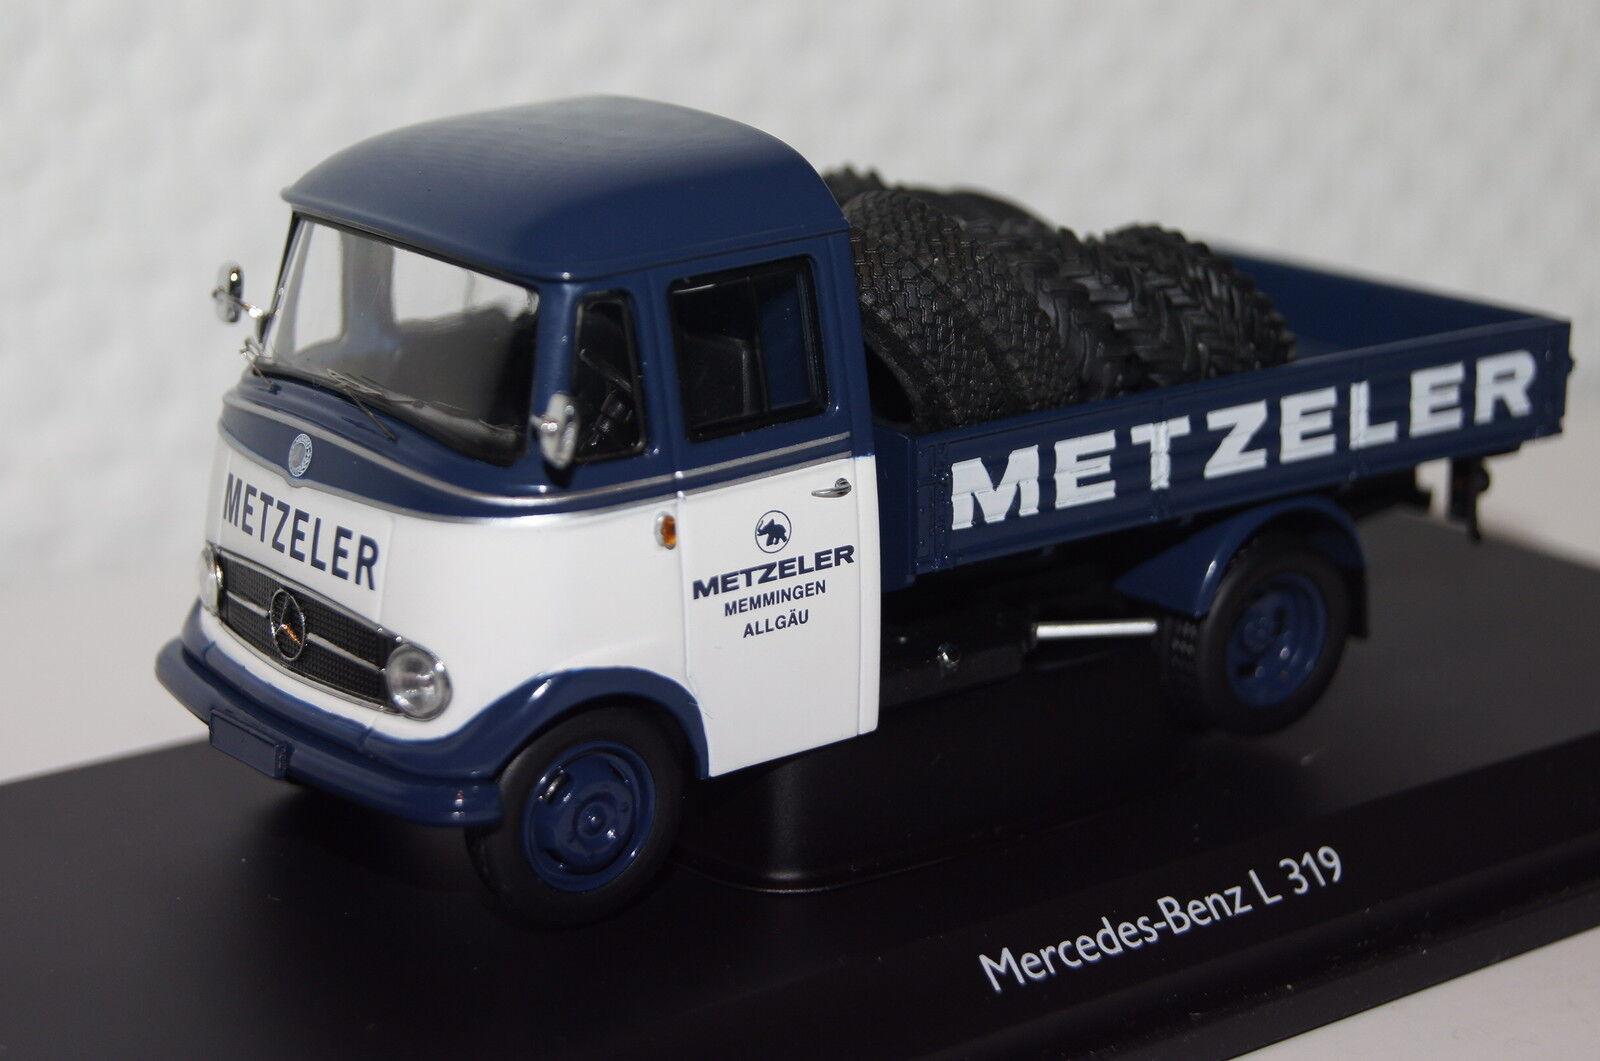 El ultimo 2018 Mercedes l319  Metzeler Metzeler Metzeler  con neumáticos blancoo-azul 1 43 Schuco nuevo + embalaje orig. 2915  se descuenta